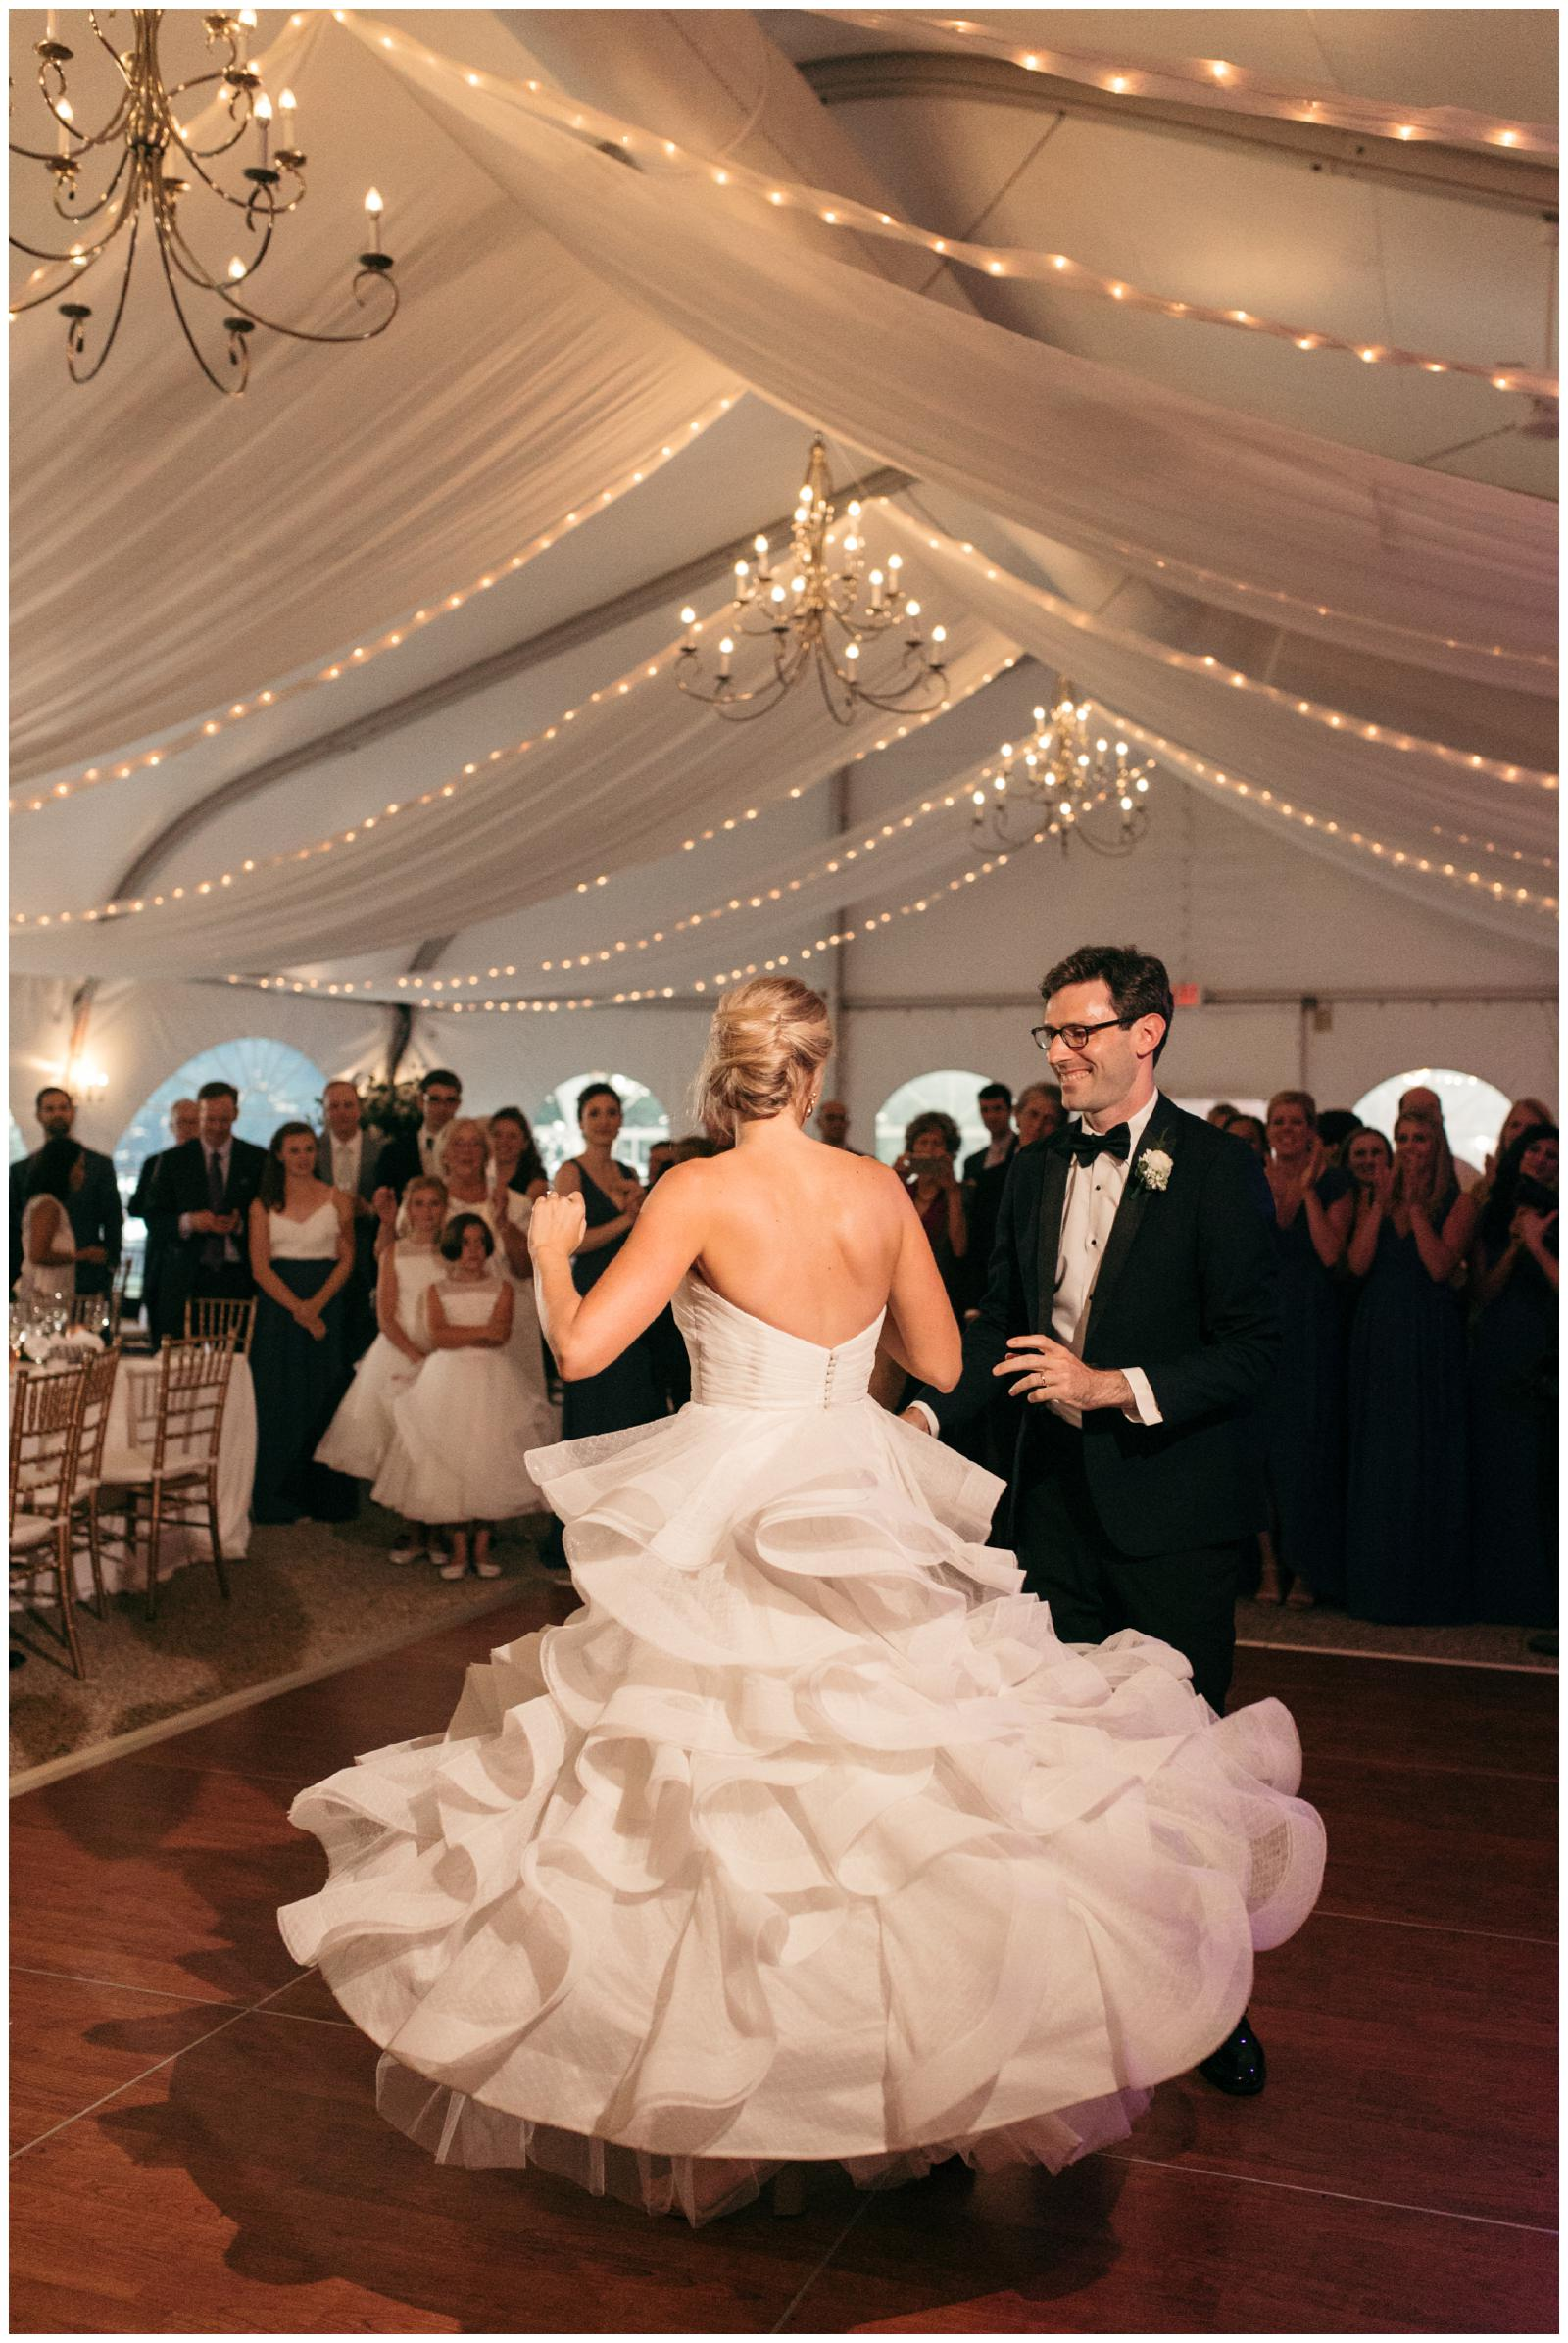 Massachusetts tent wedding reception